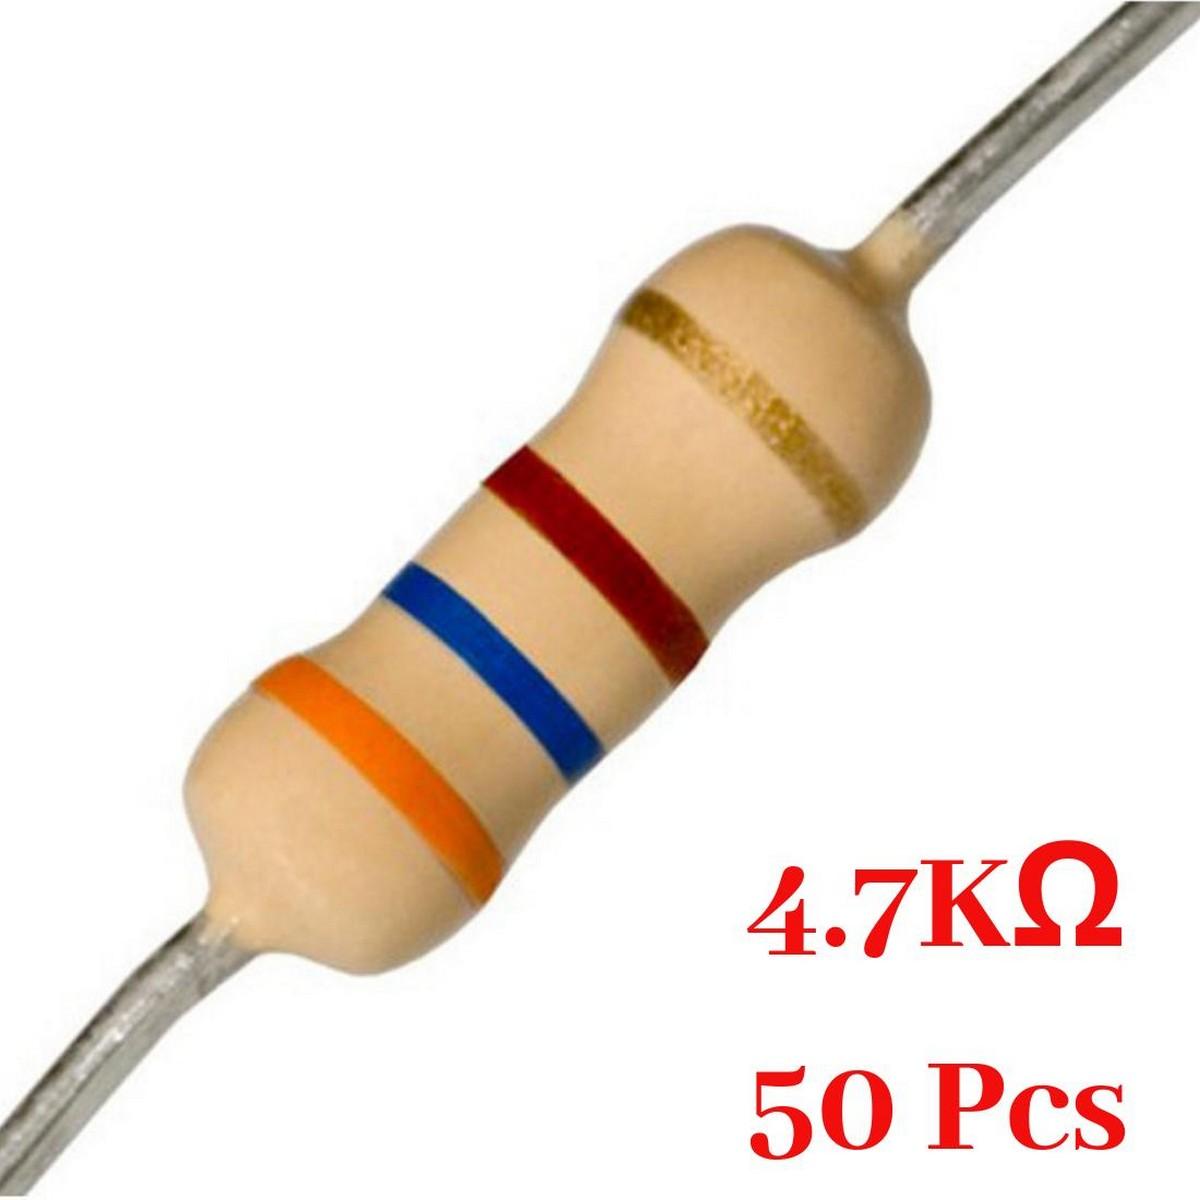 50 Pcs- 4.7K Ohm resistor